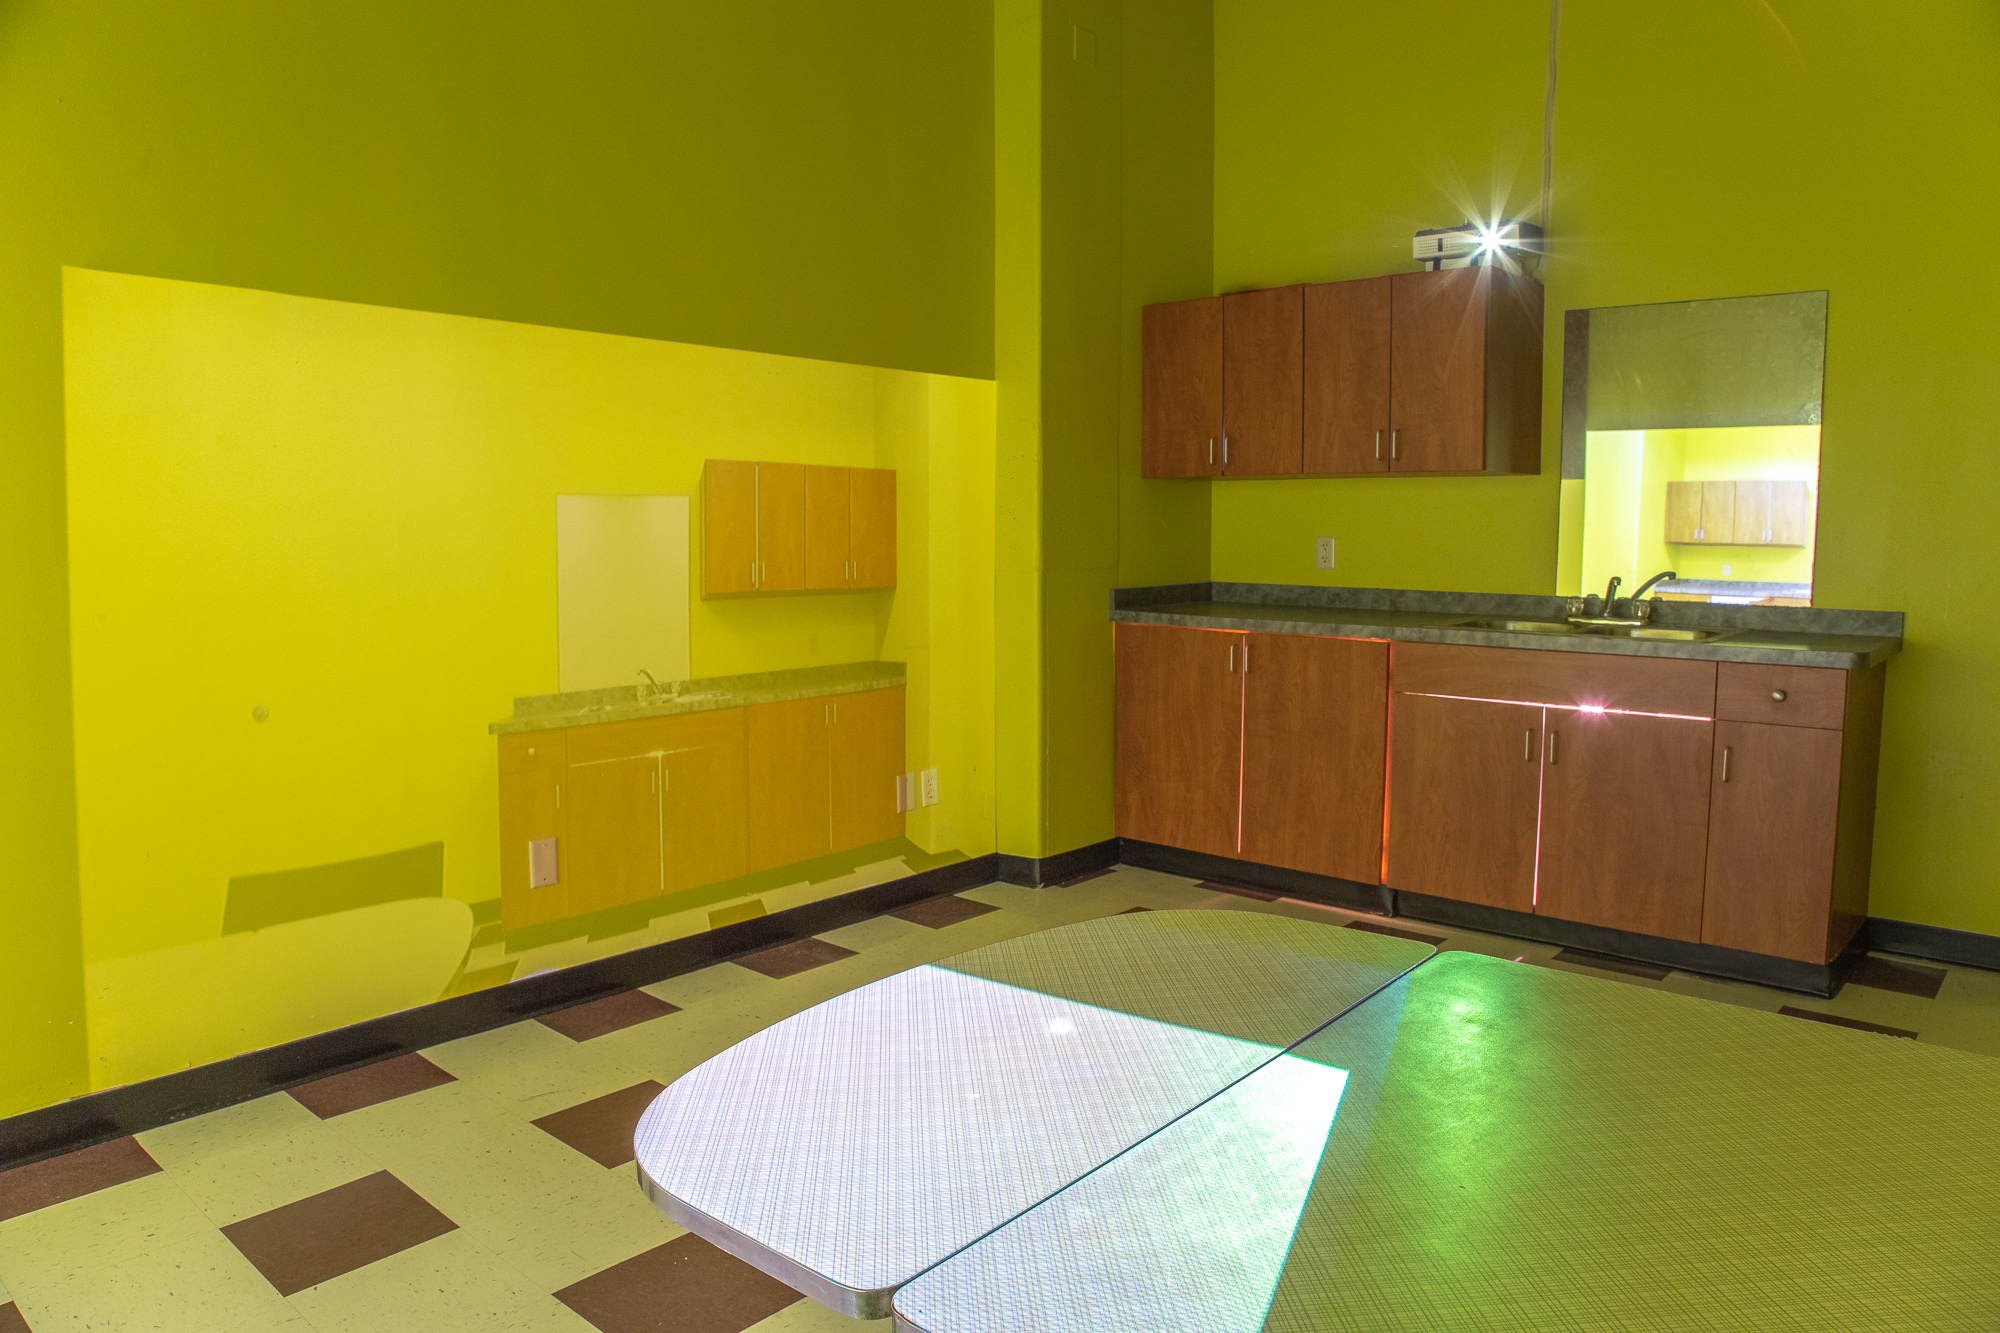 Alexandres_Delirium-Situ_Gilman_Yellow_Installation-IMG_6249-HDR.jpg